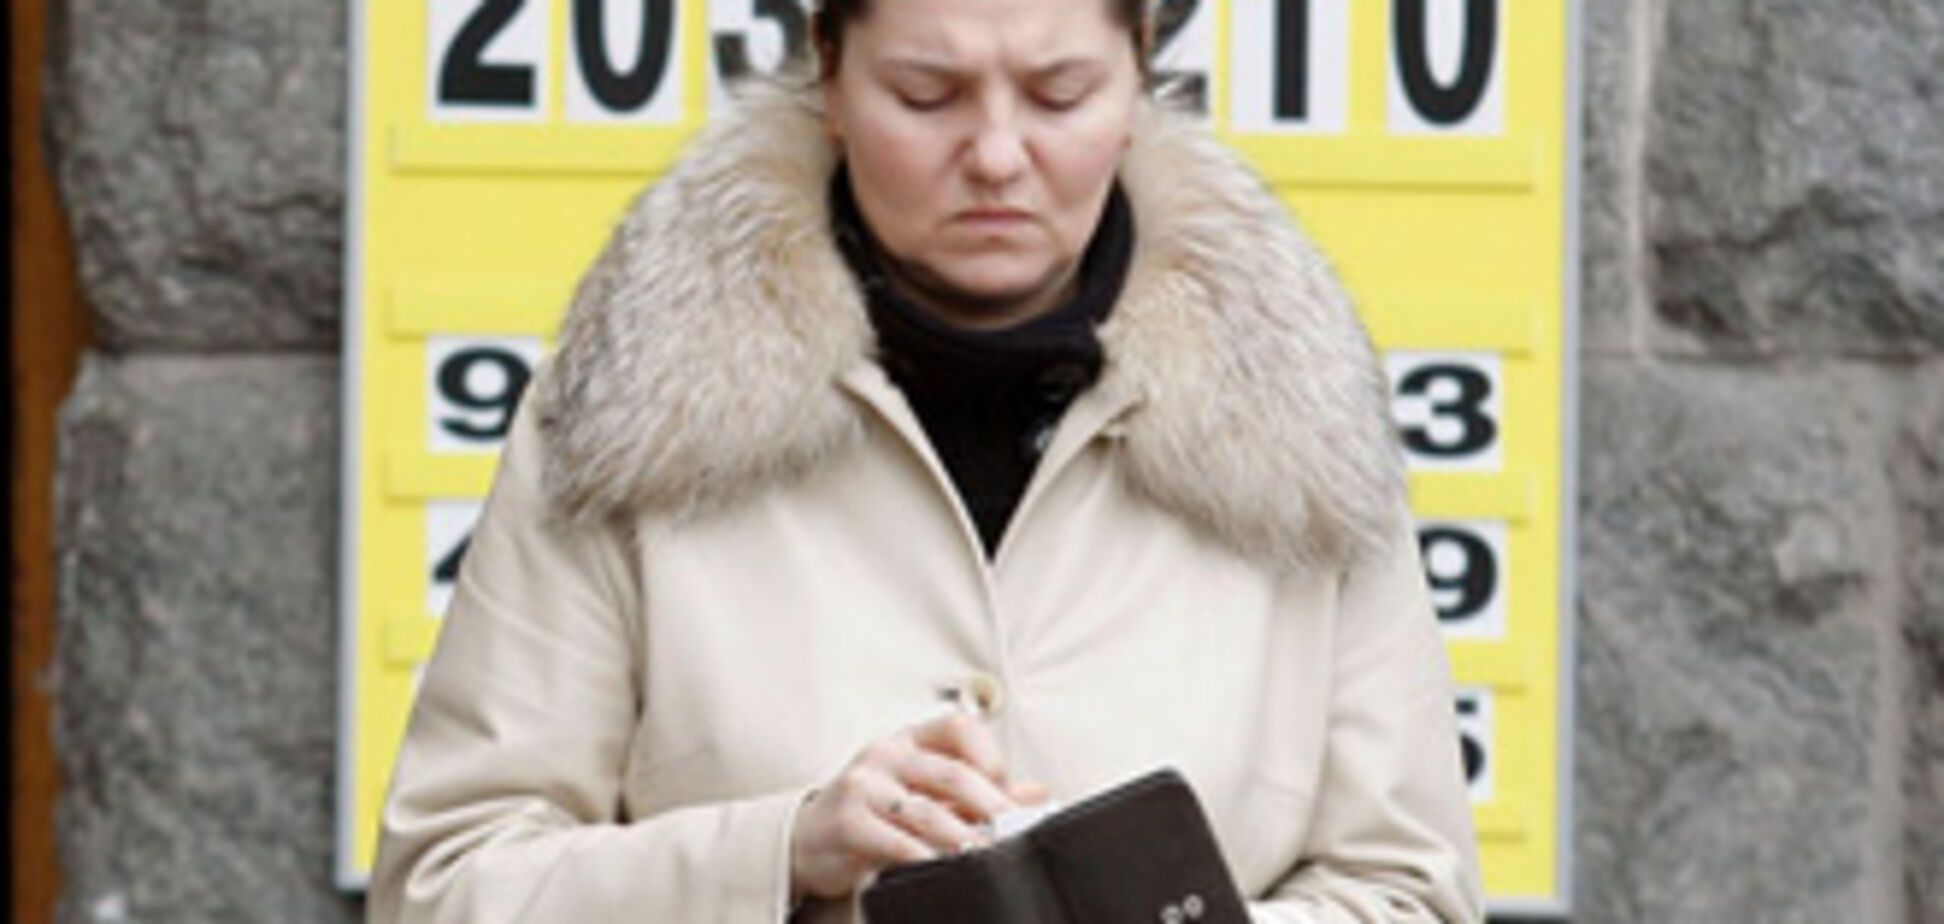 Зарплаты украинцев упали до уровня 1999 года